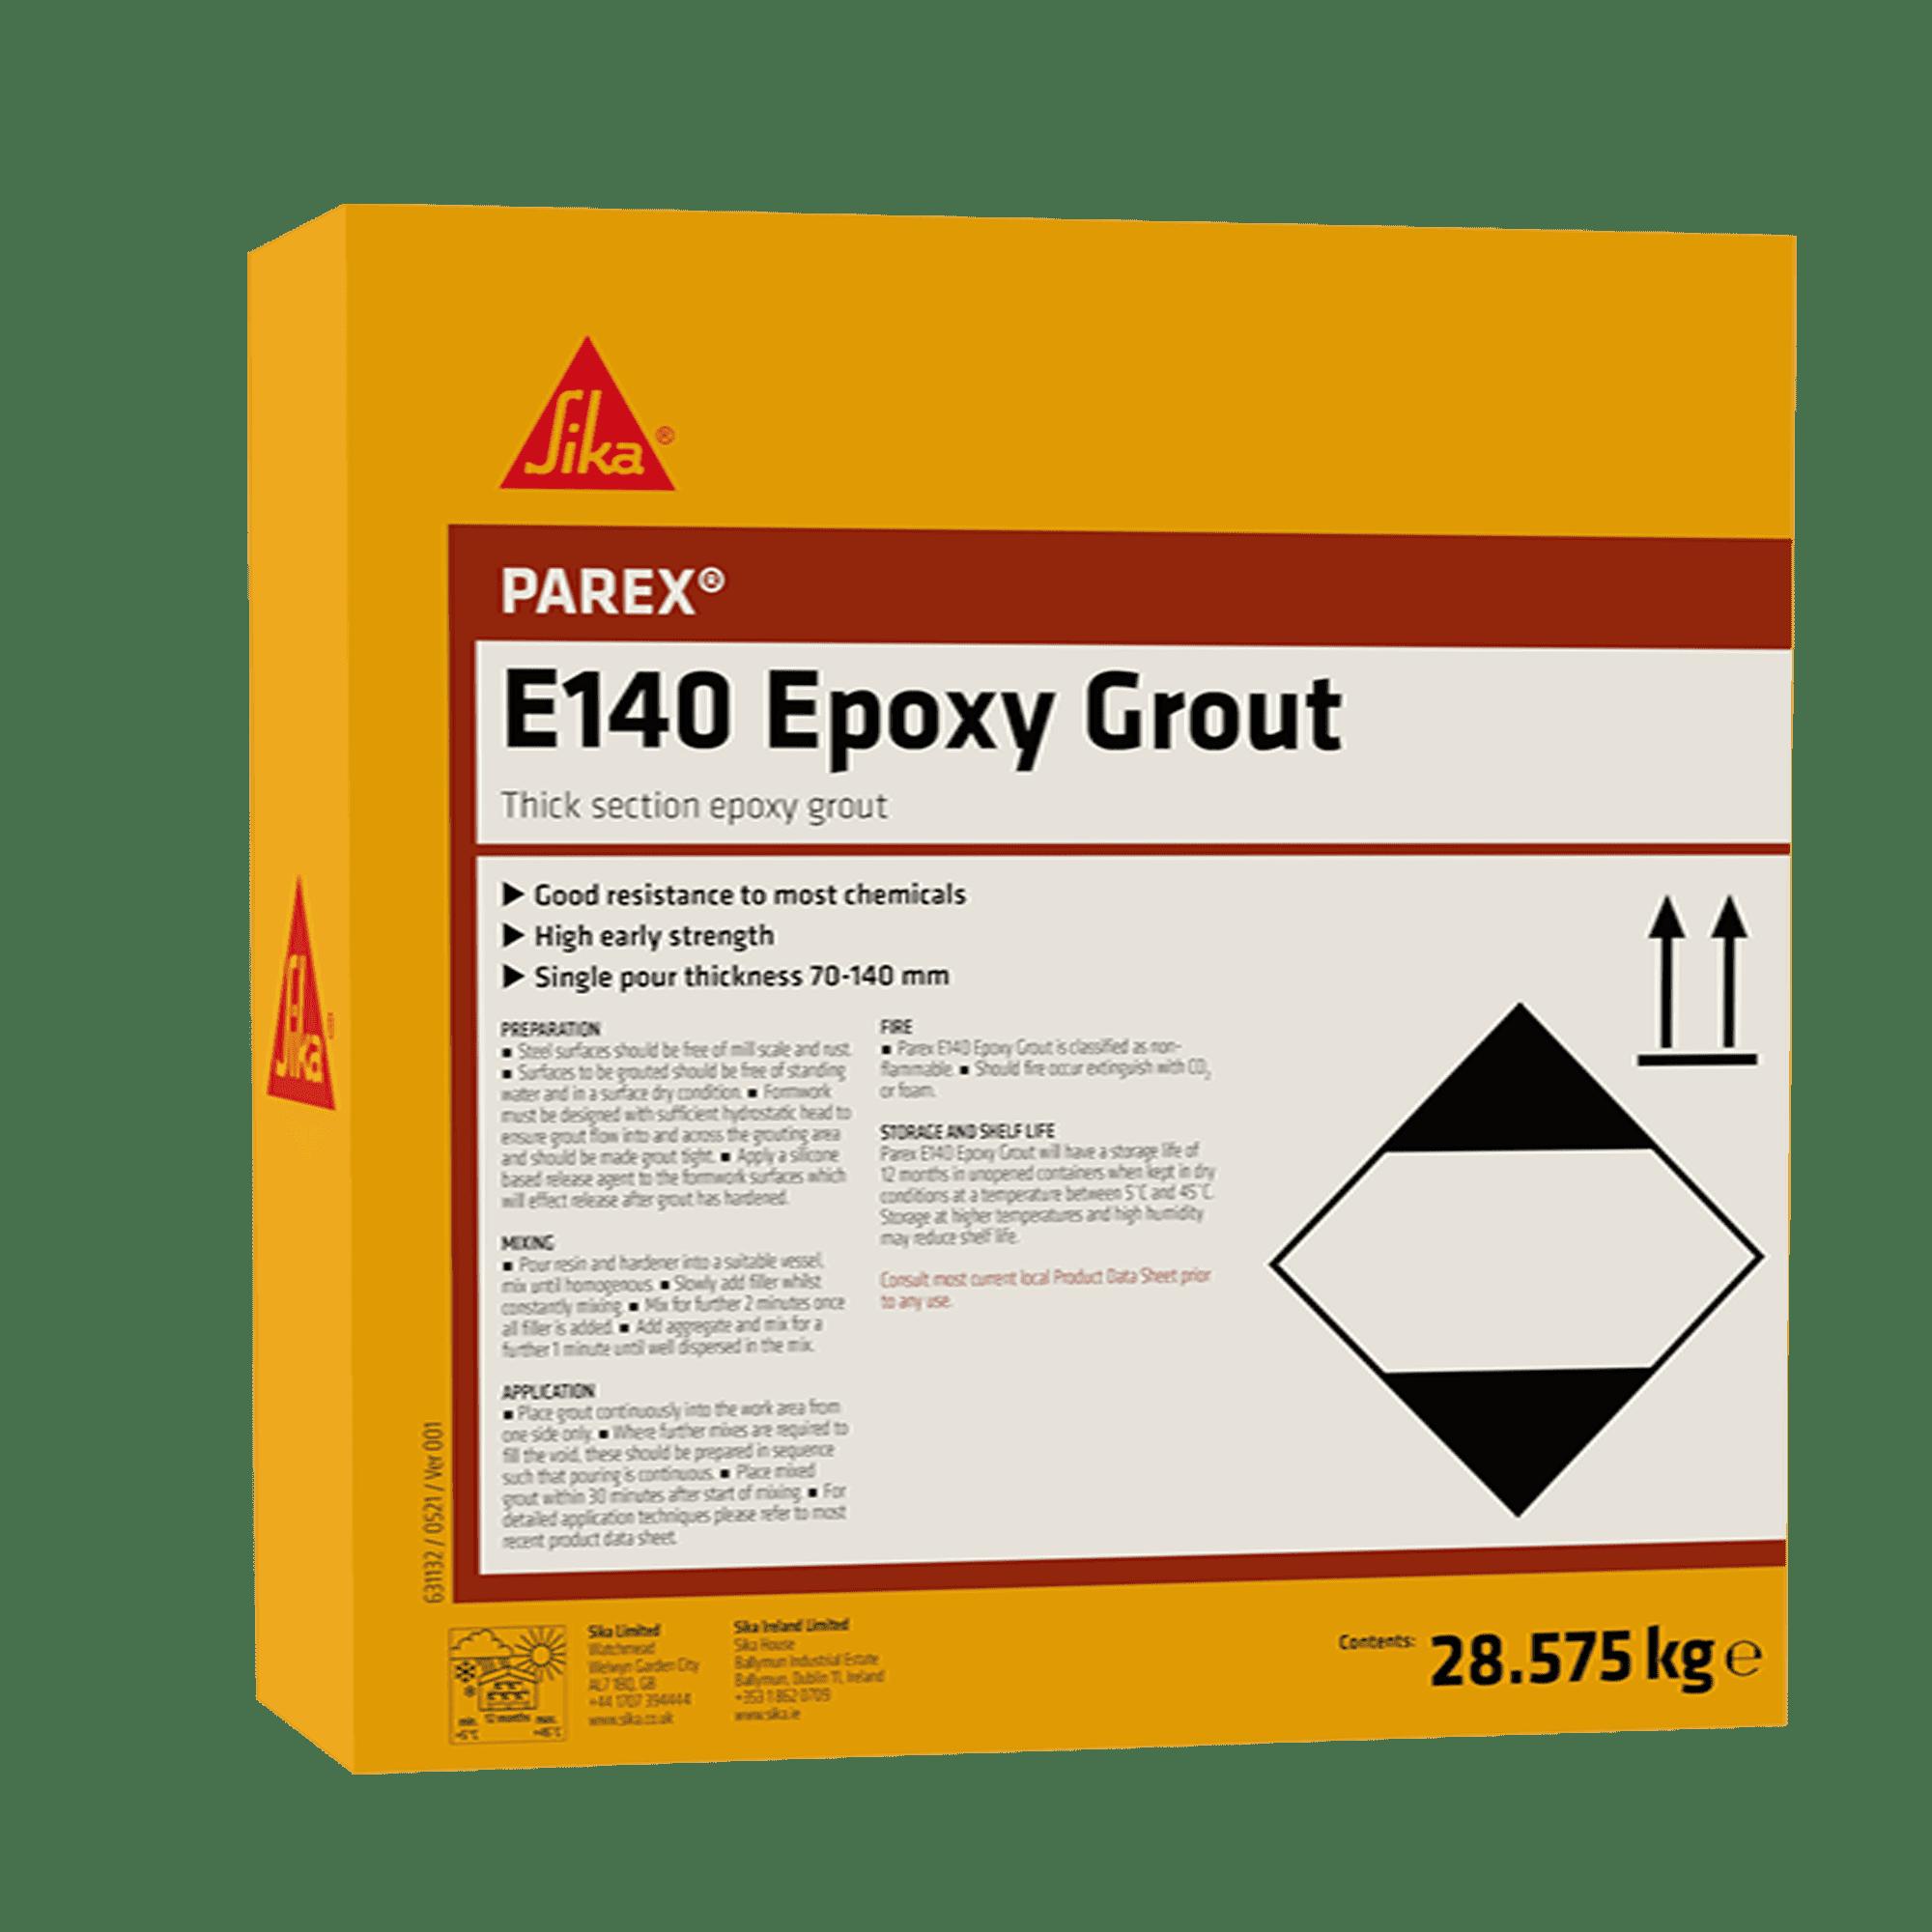 Parex E140 Epoxy Grout